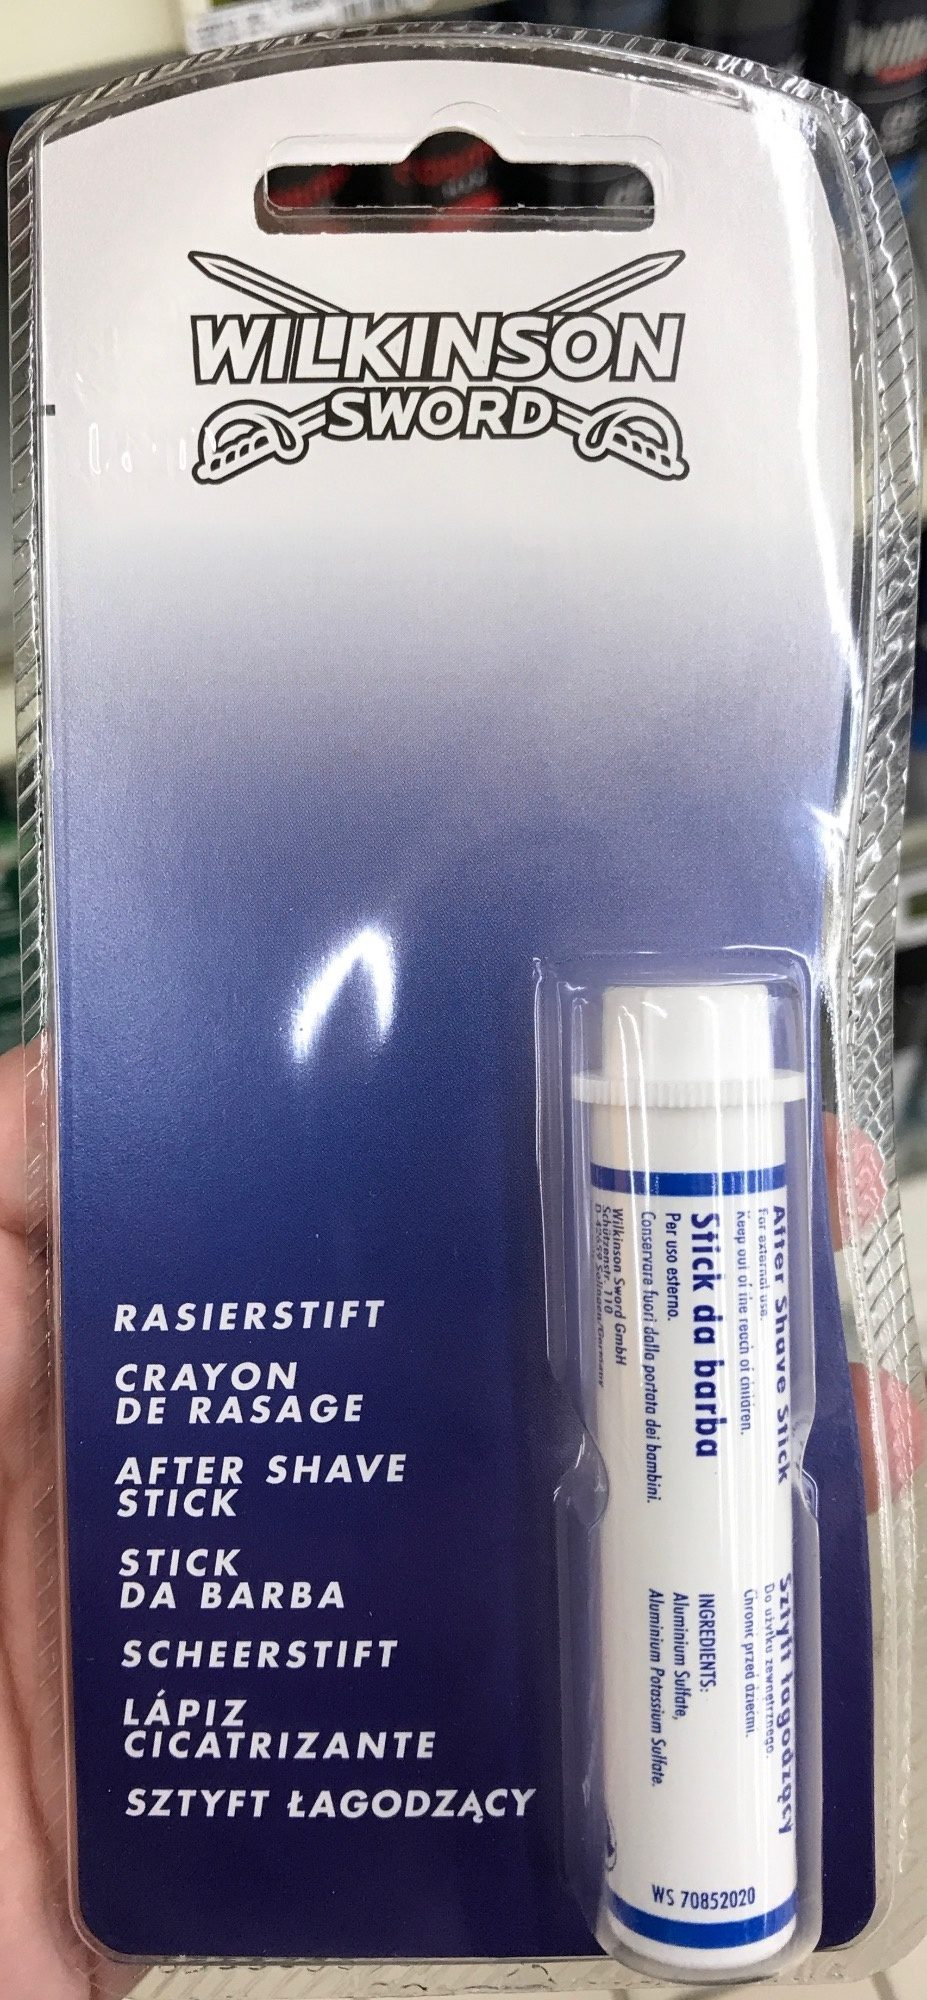 Crayon de rasage - Produit